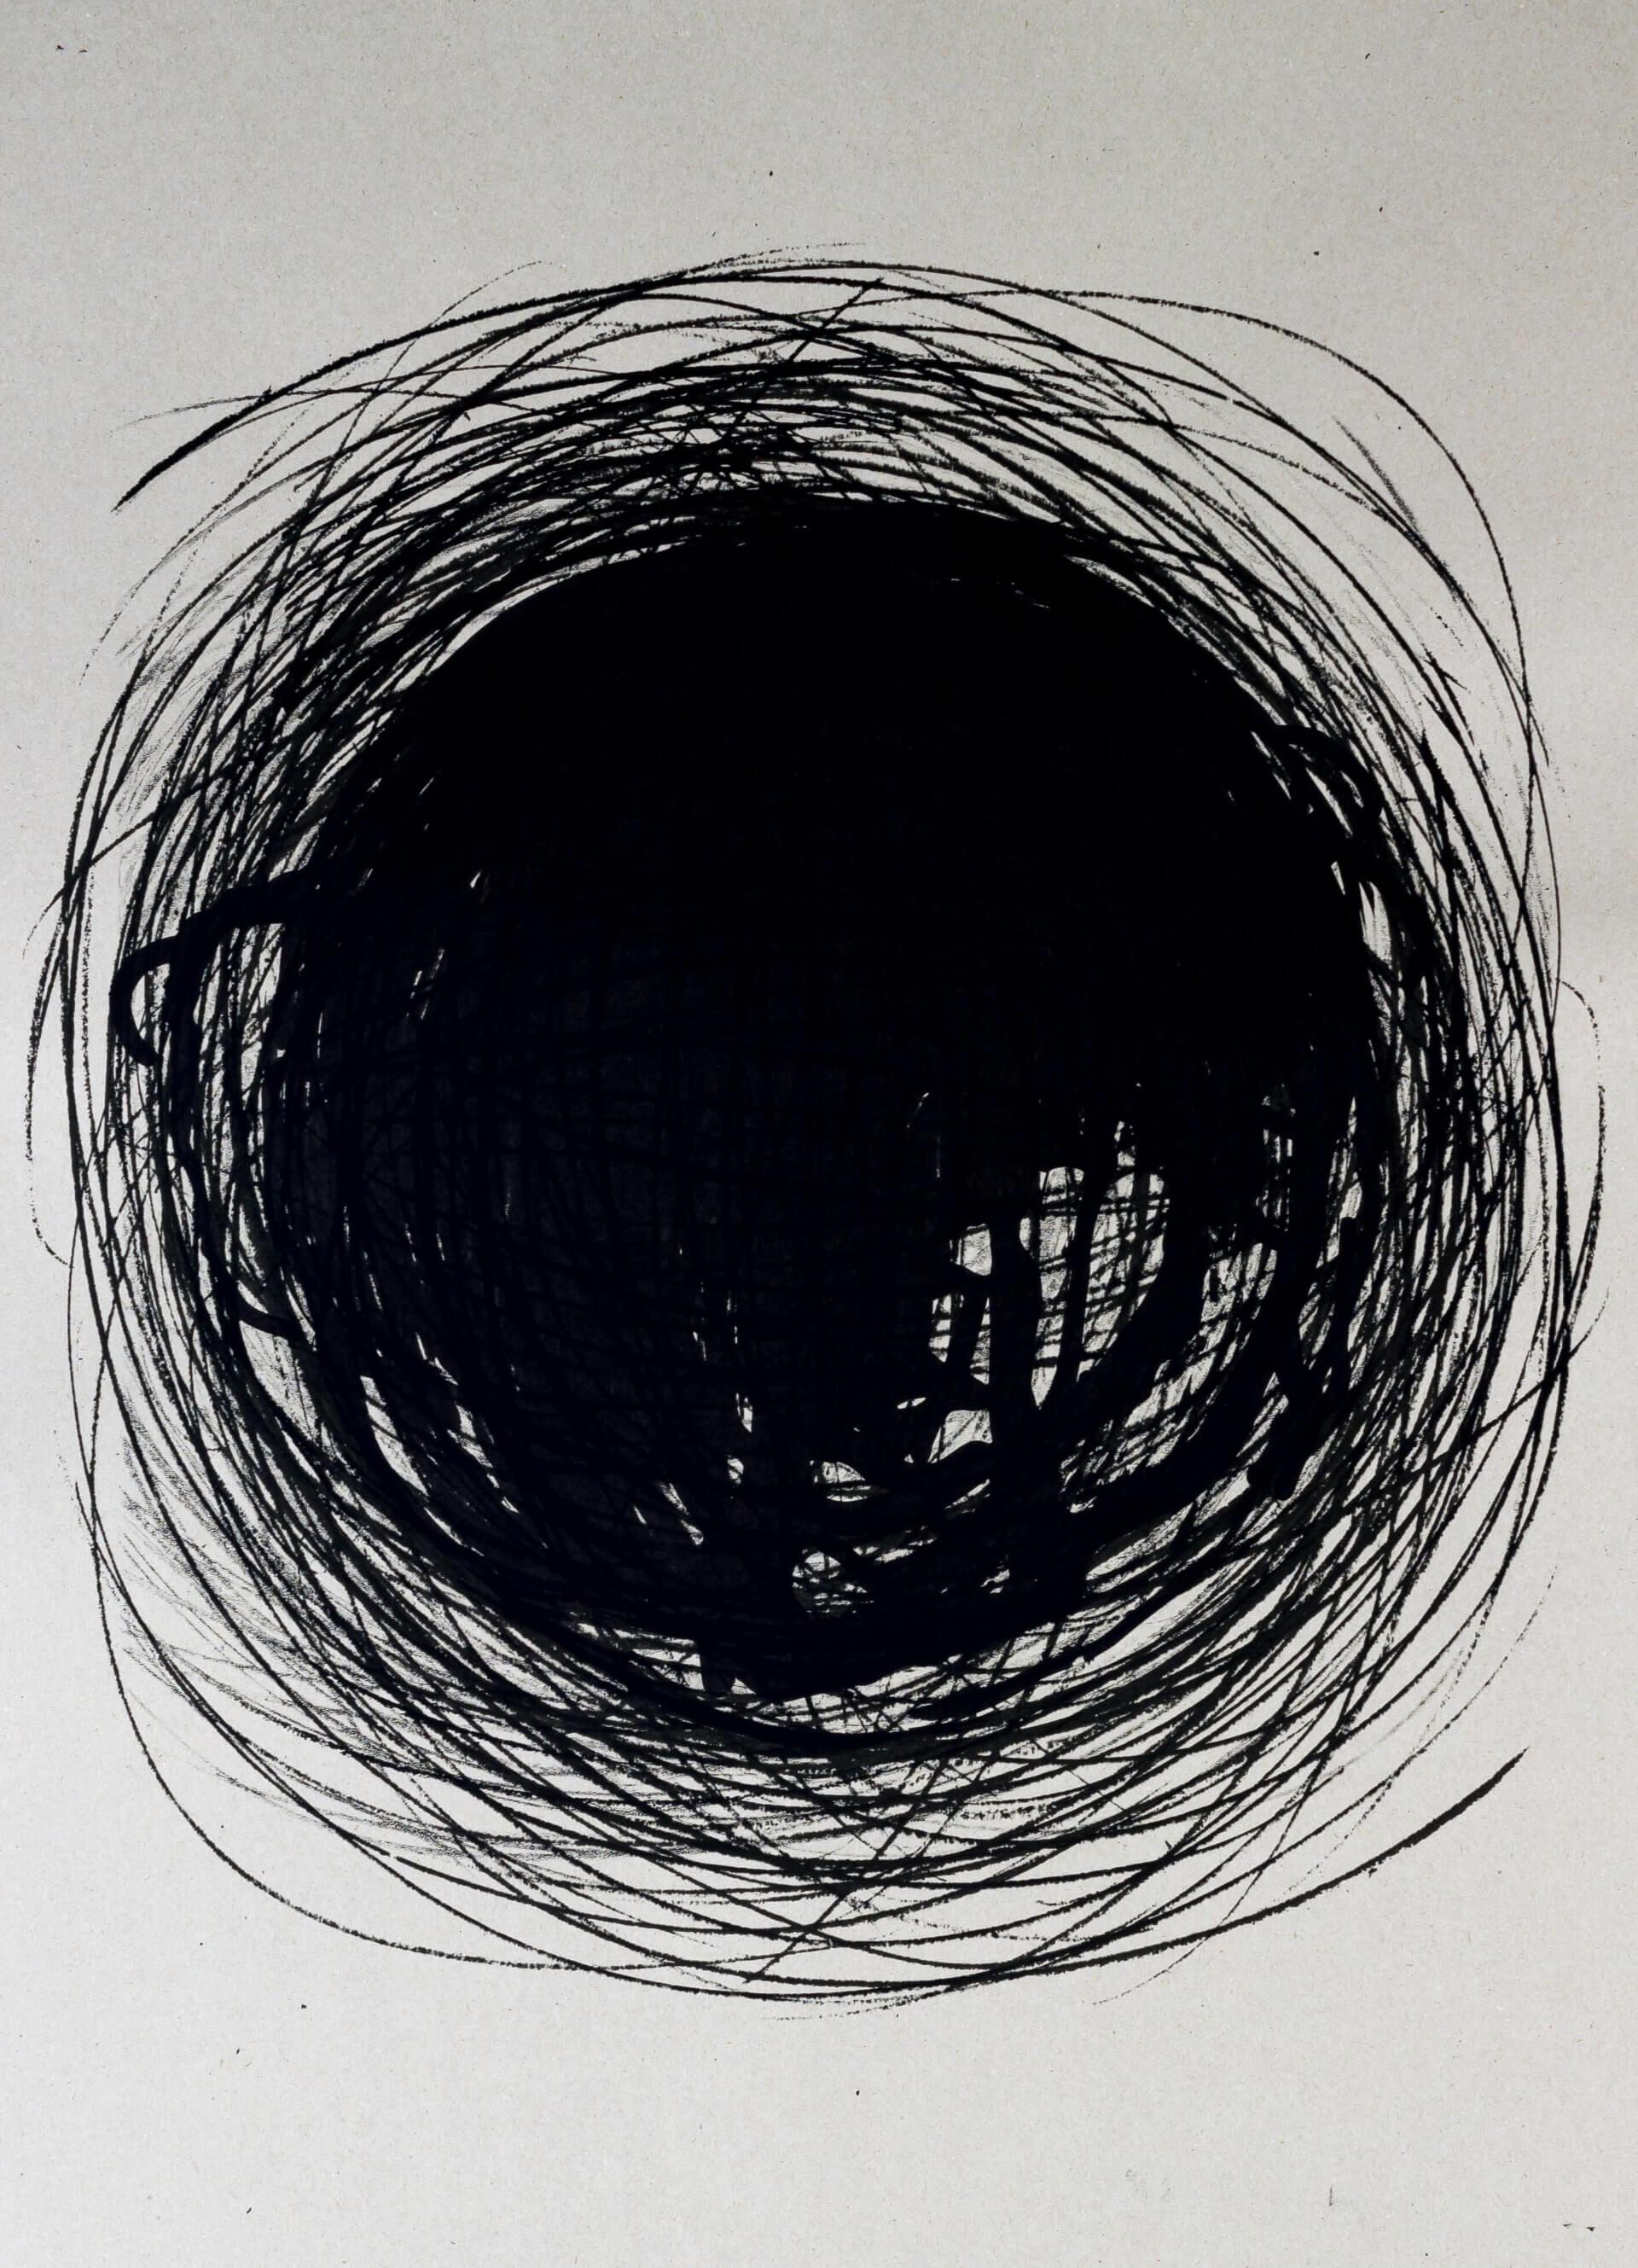 Katharina Albers, Transformation XXXIV, 2011, Siebdruck, Unikat, 59,5x42cm